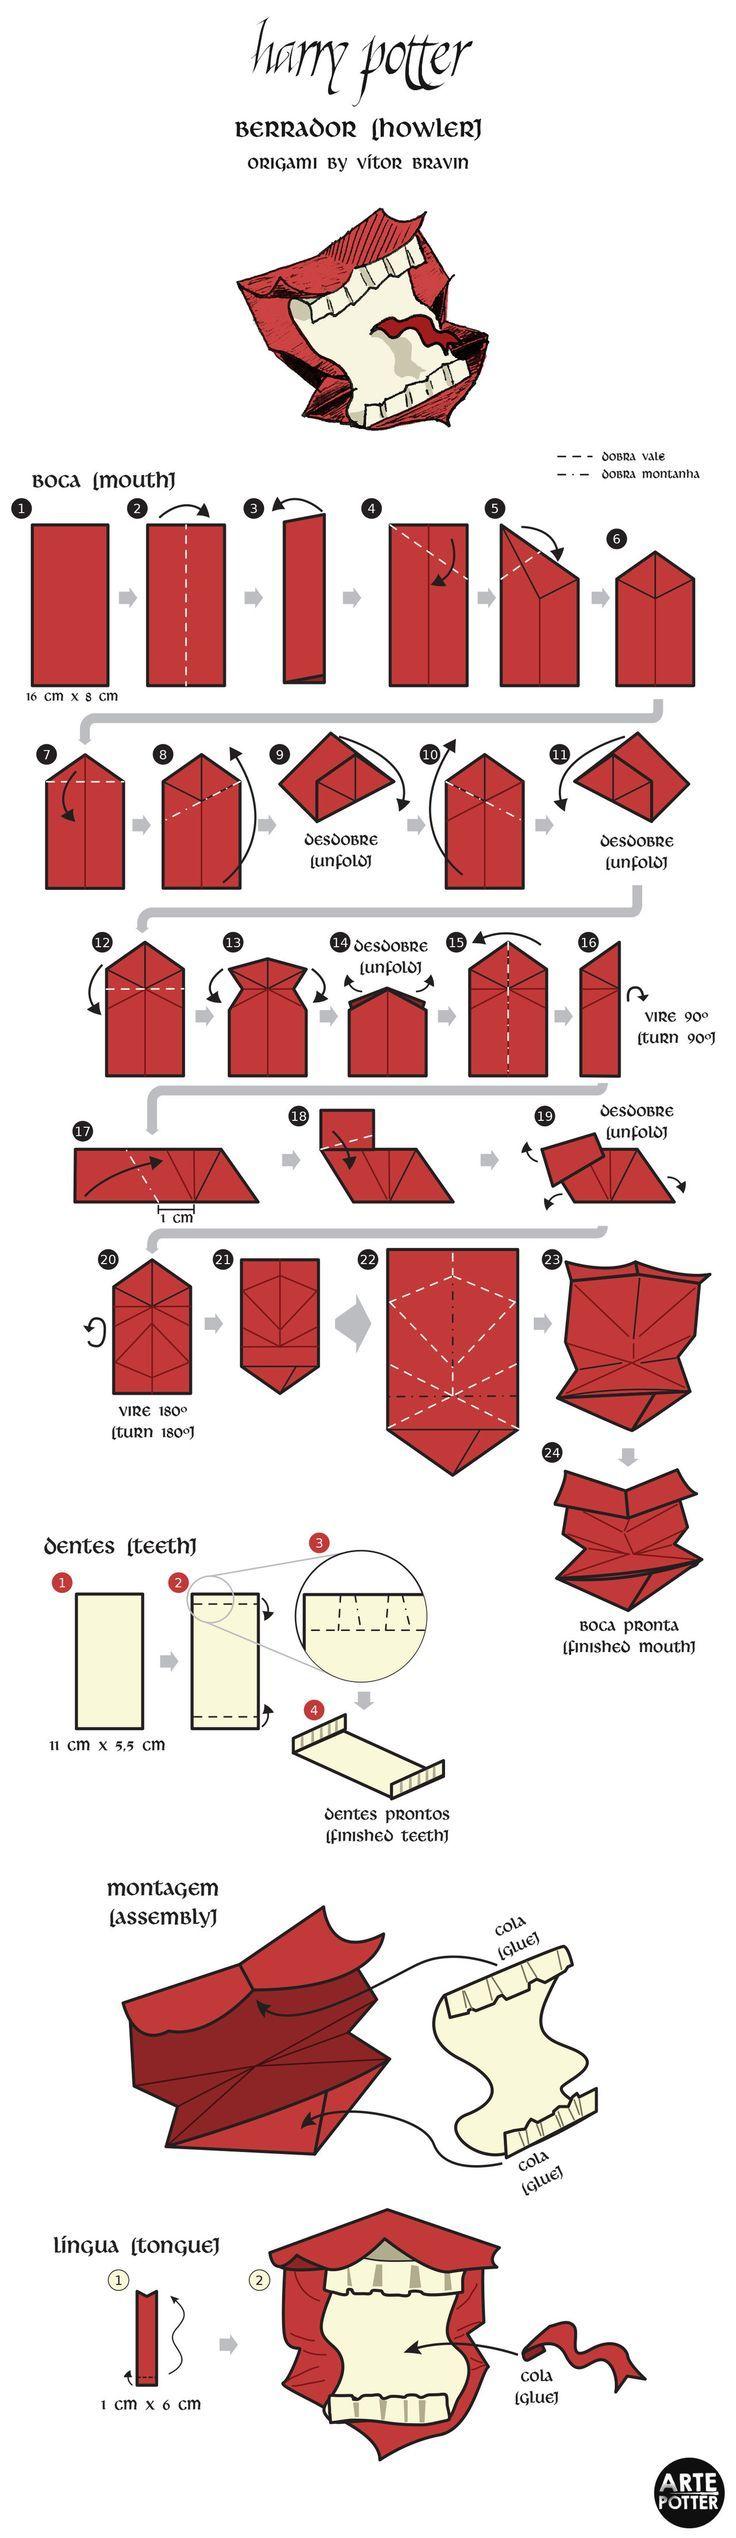 Origami Design - Howler by http://vitorbravin.deviantart.com on @deviantART